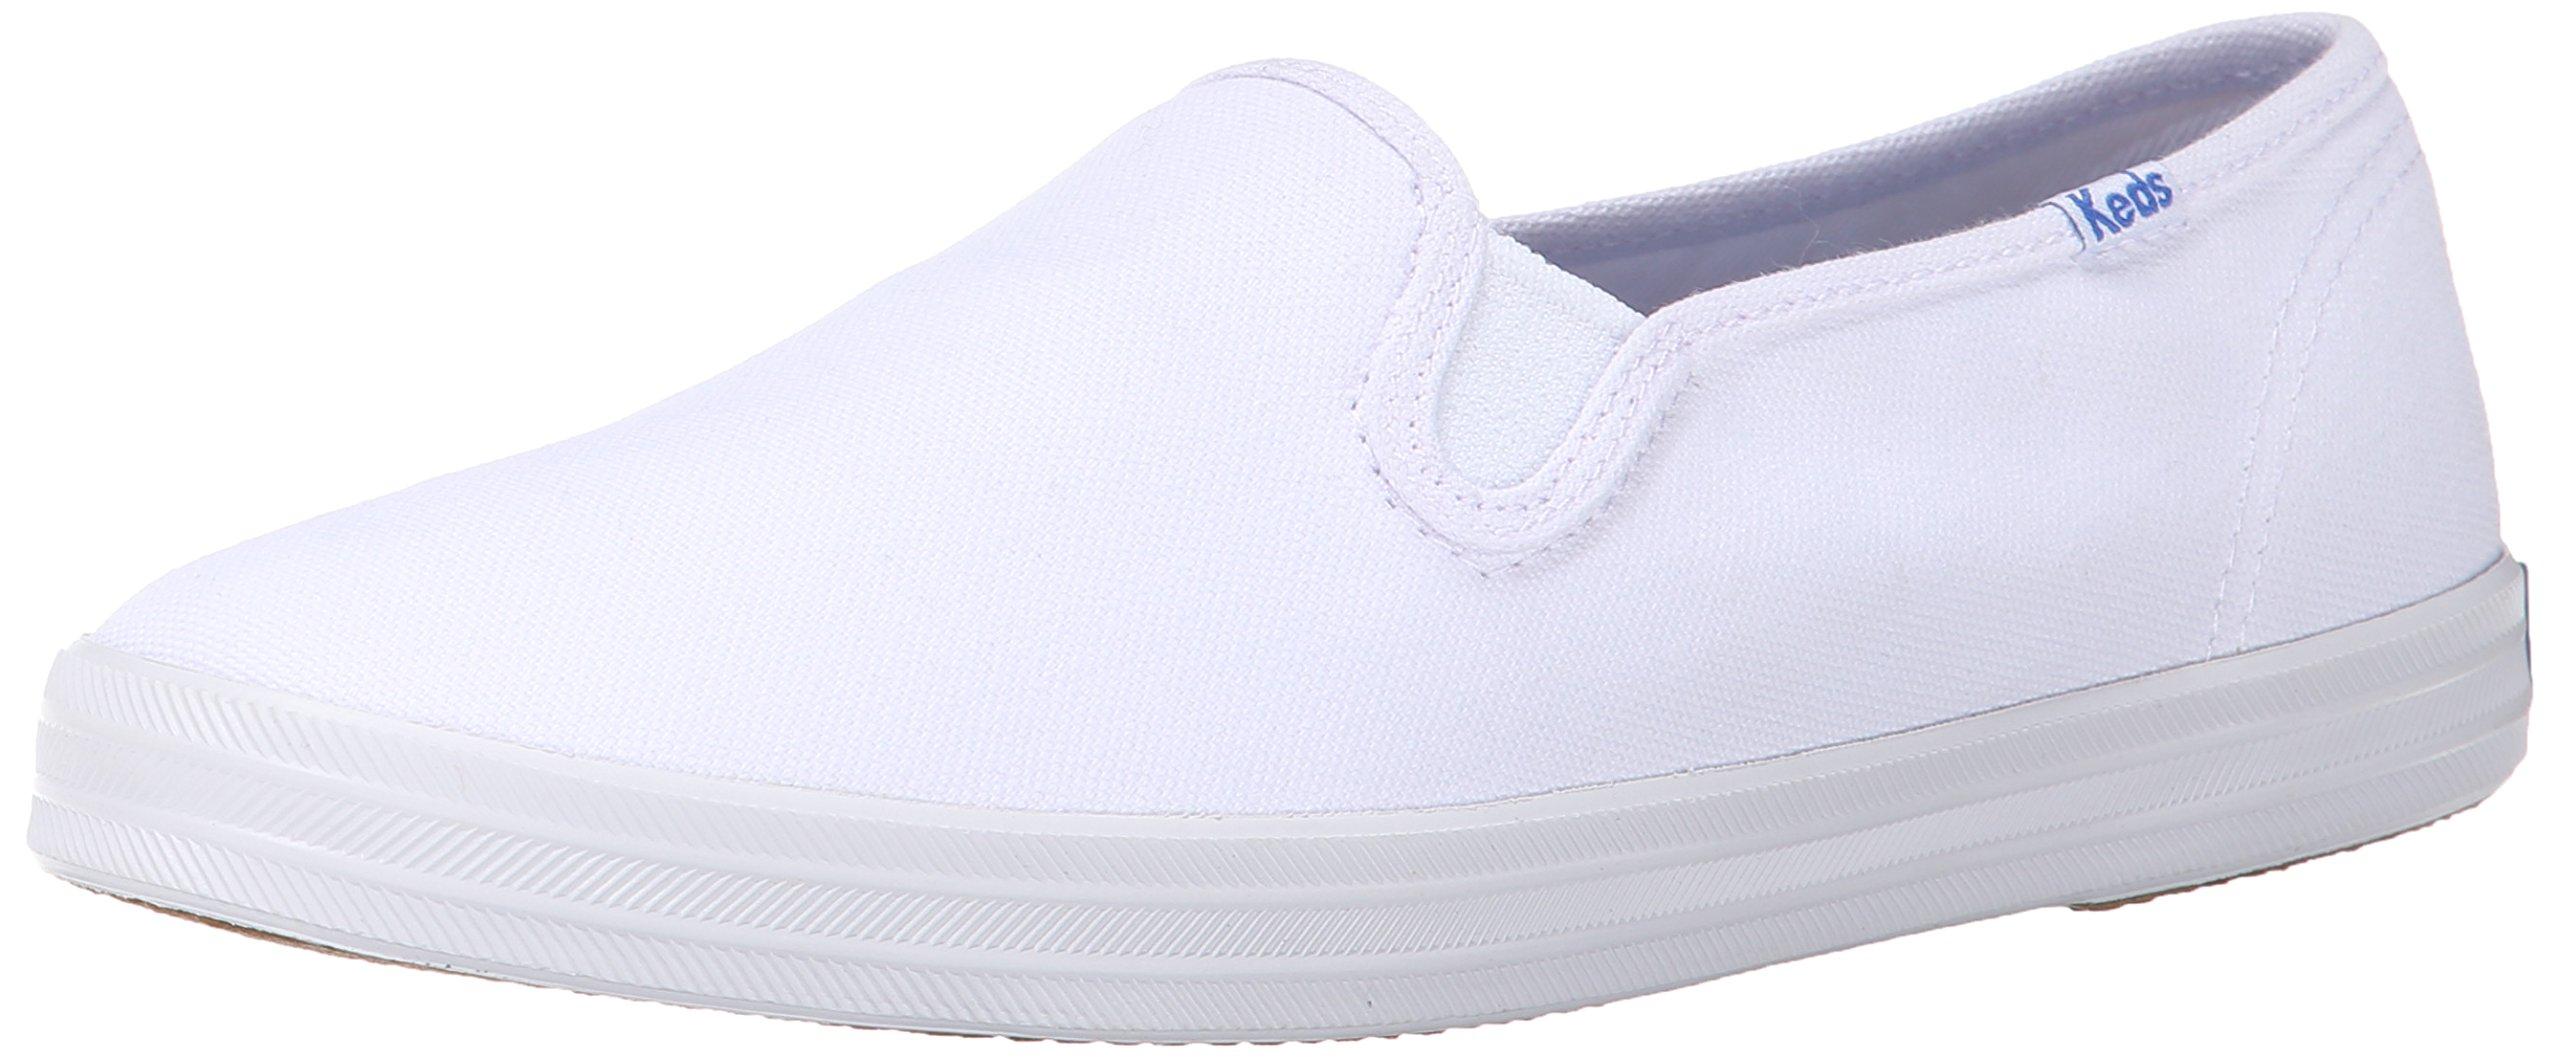 Keds Women's Champion Original Canvas Slip-On Sneaker, White Canvas, 9 M US